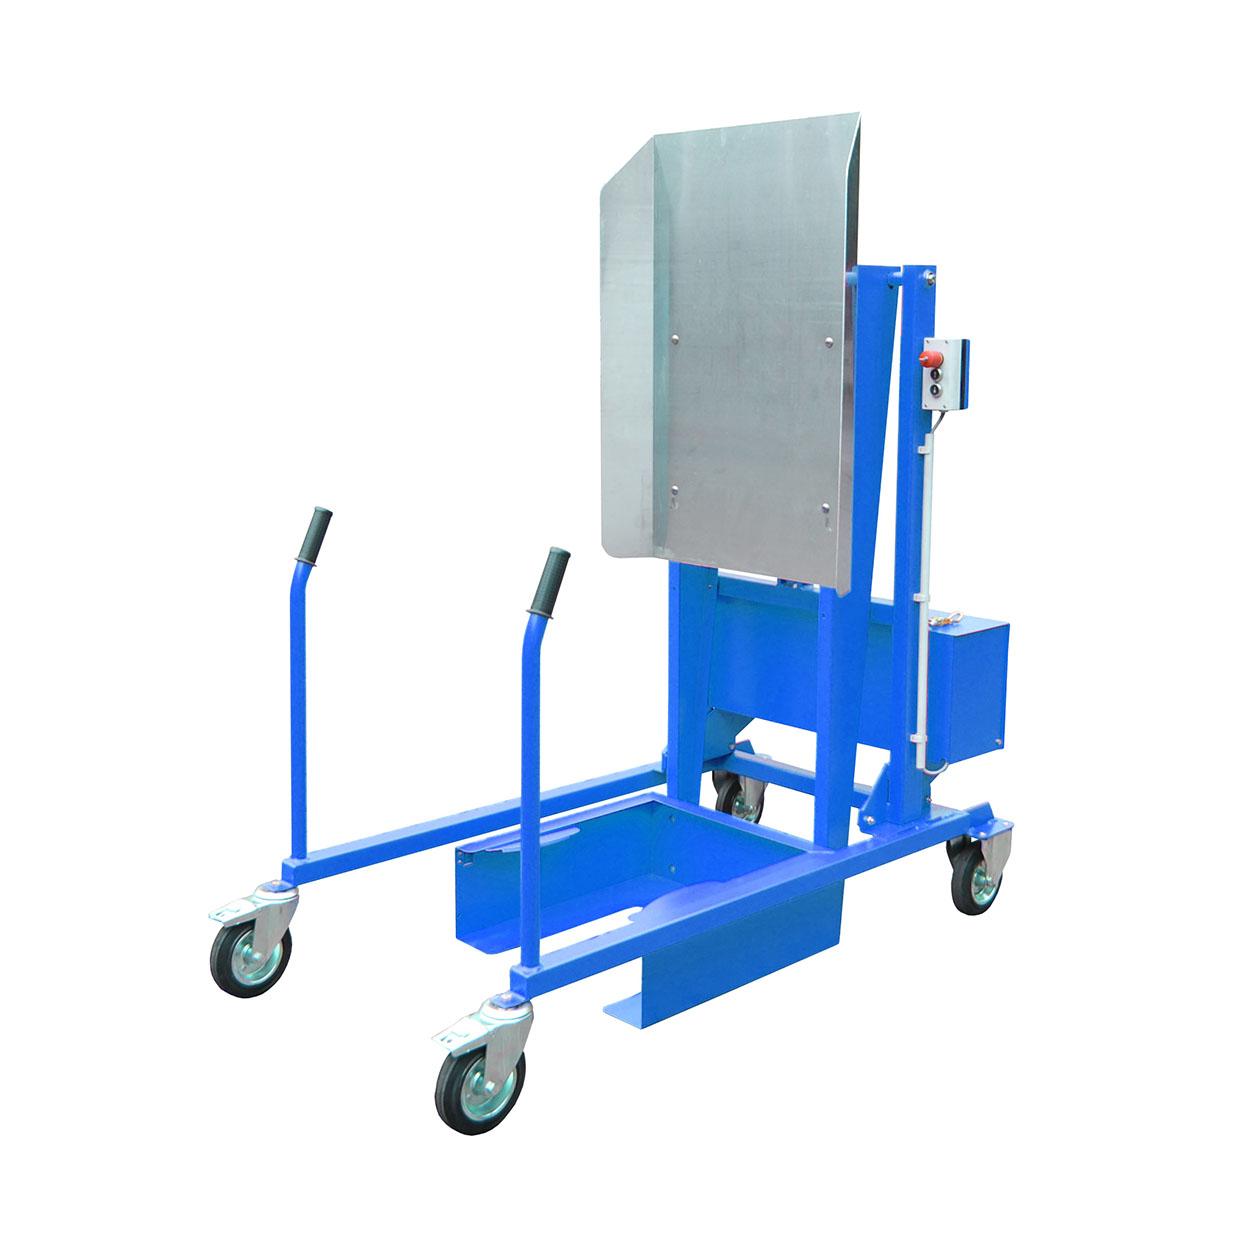 Pojízdný vyklápěč popelnic elektricko-hydraulický, 12 V